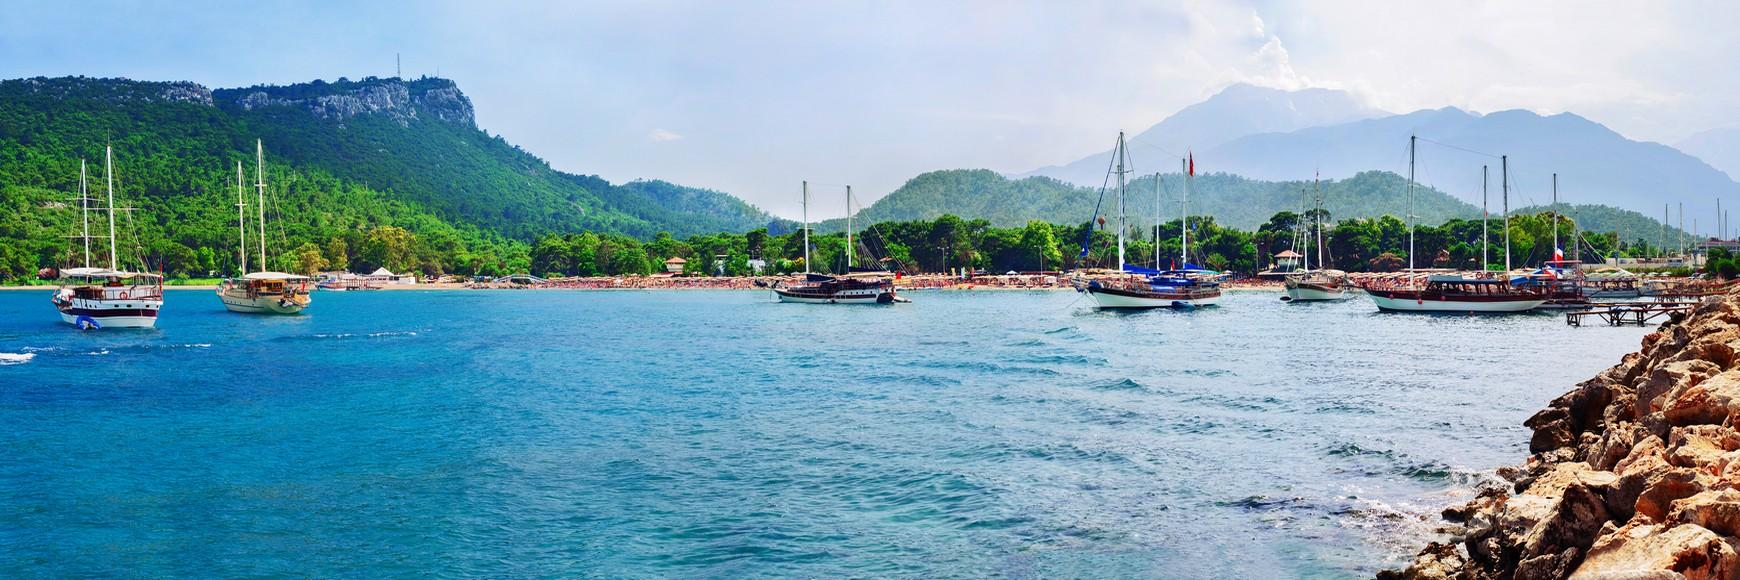 noleggio barca a vela Turchia